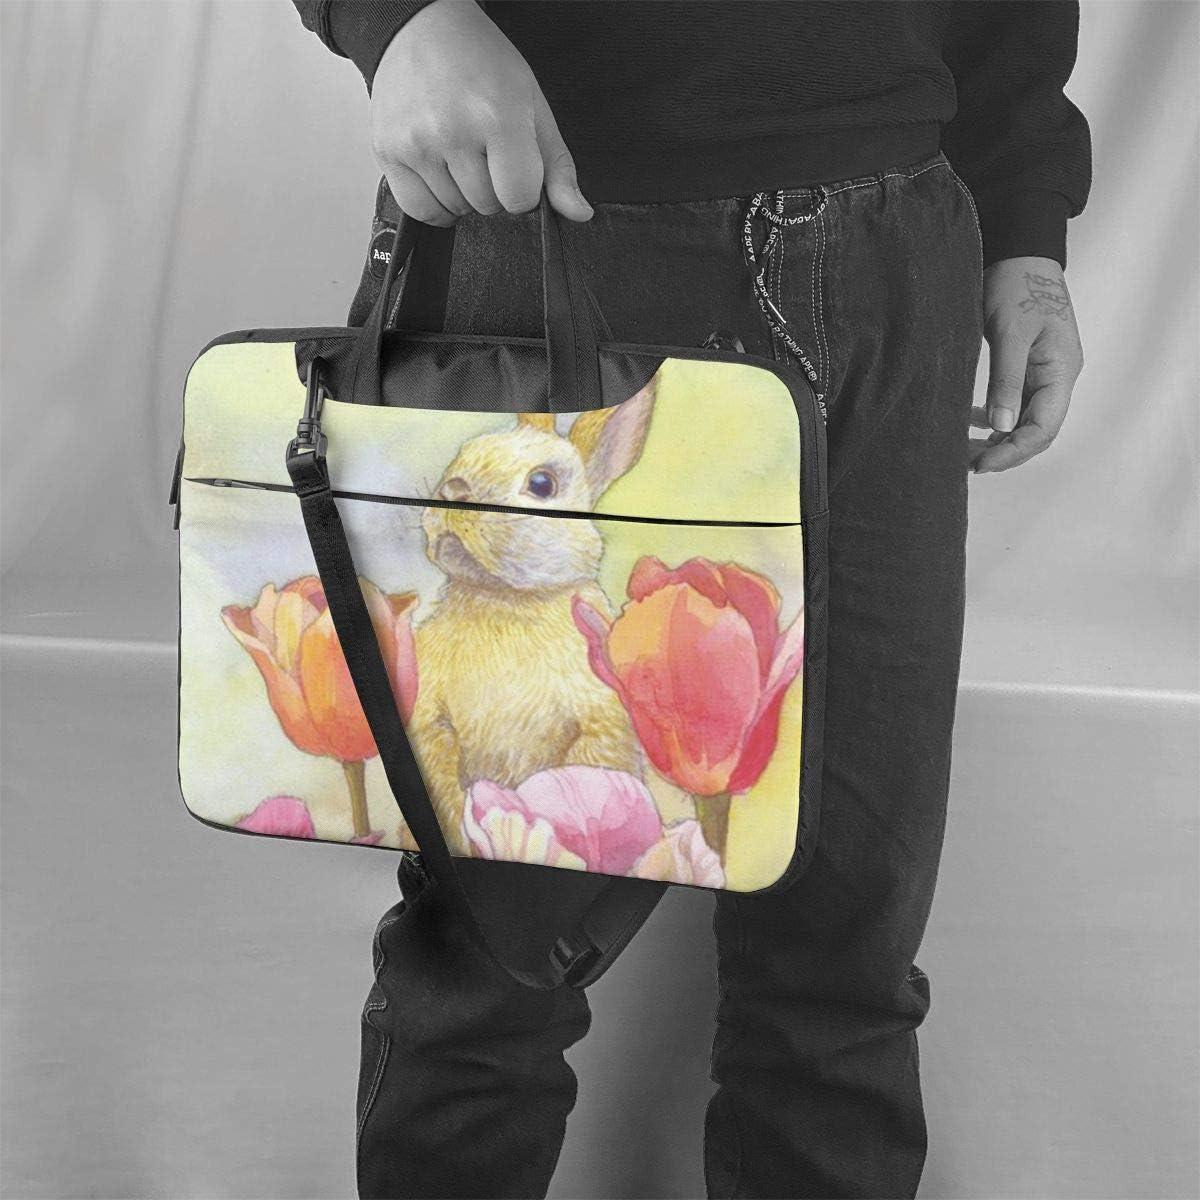 14 Inch Notebook Sleeve Carrying Case with Trolley Belt for Lenovo Acer Asus Dell Lenovo Hp Samsung Ultrabook Chromebook Bunny Tulip Laptop Shoulder Messenger Bag